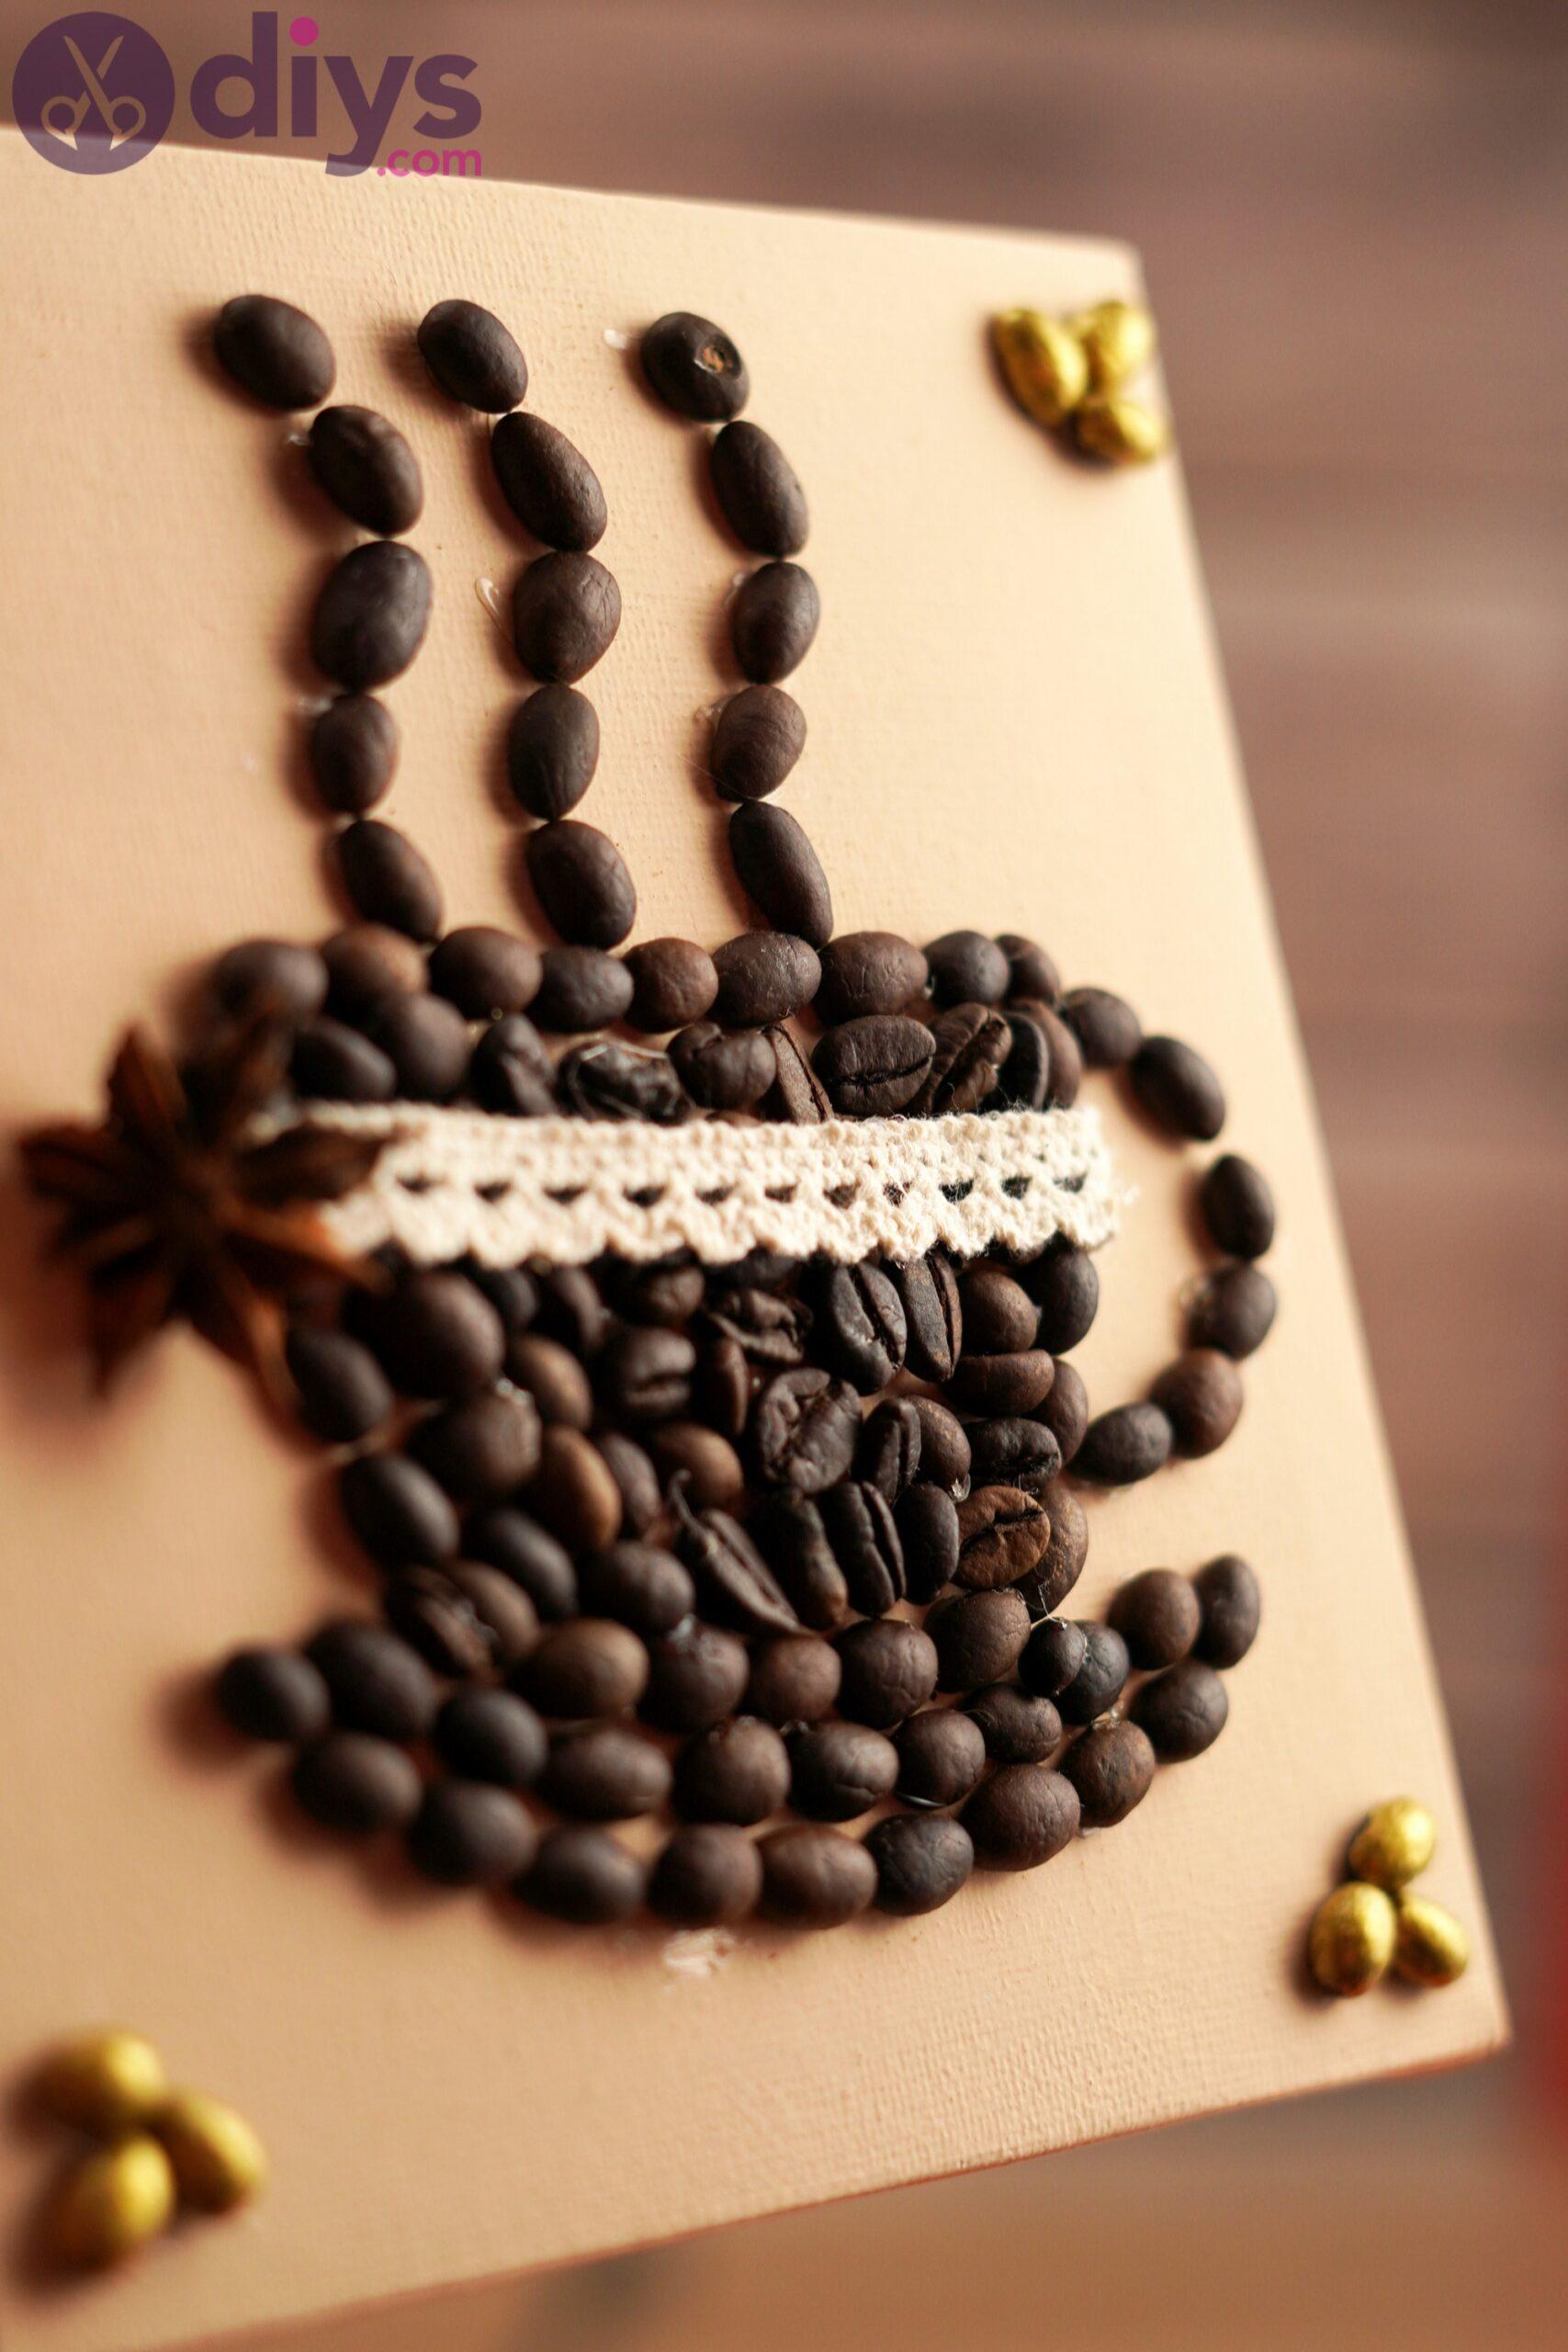 Coffee beans art photos (8)